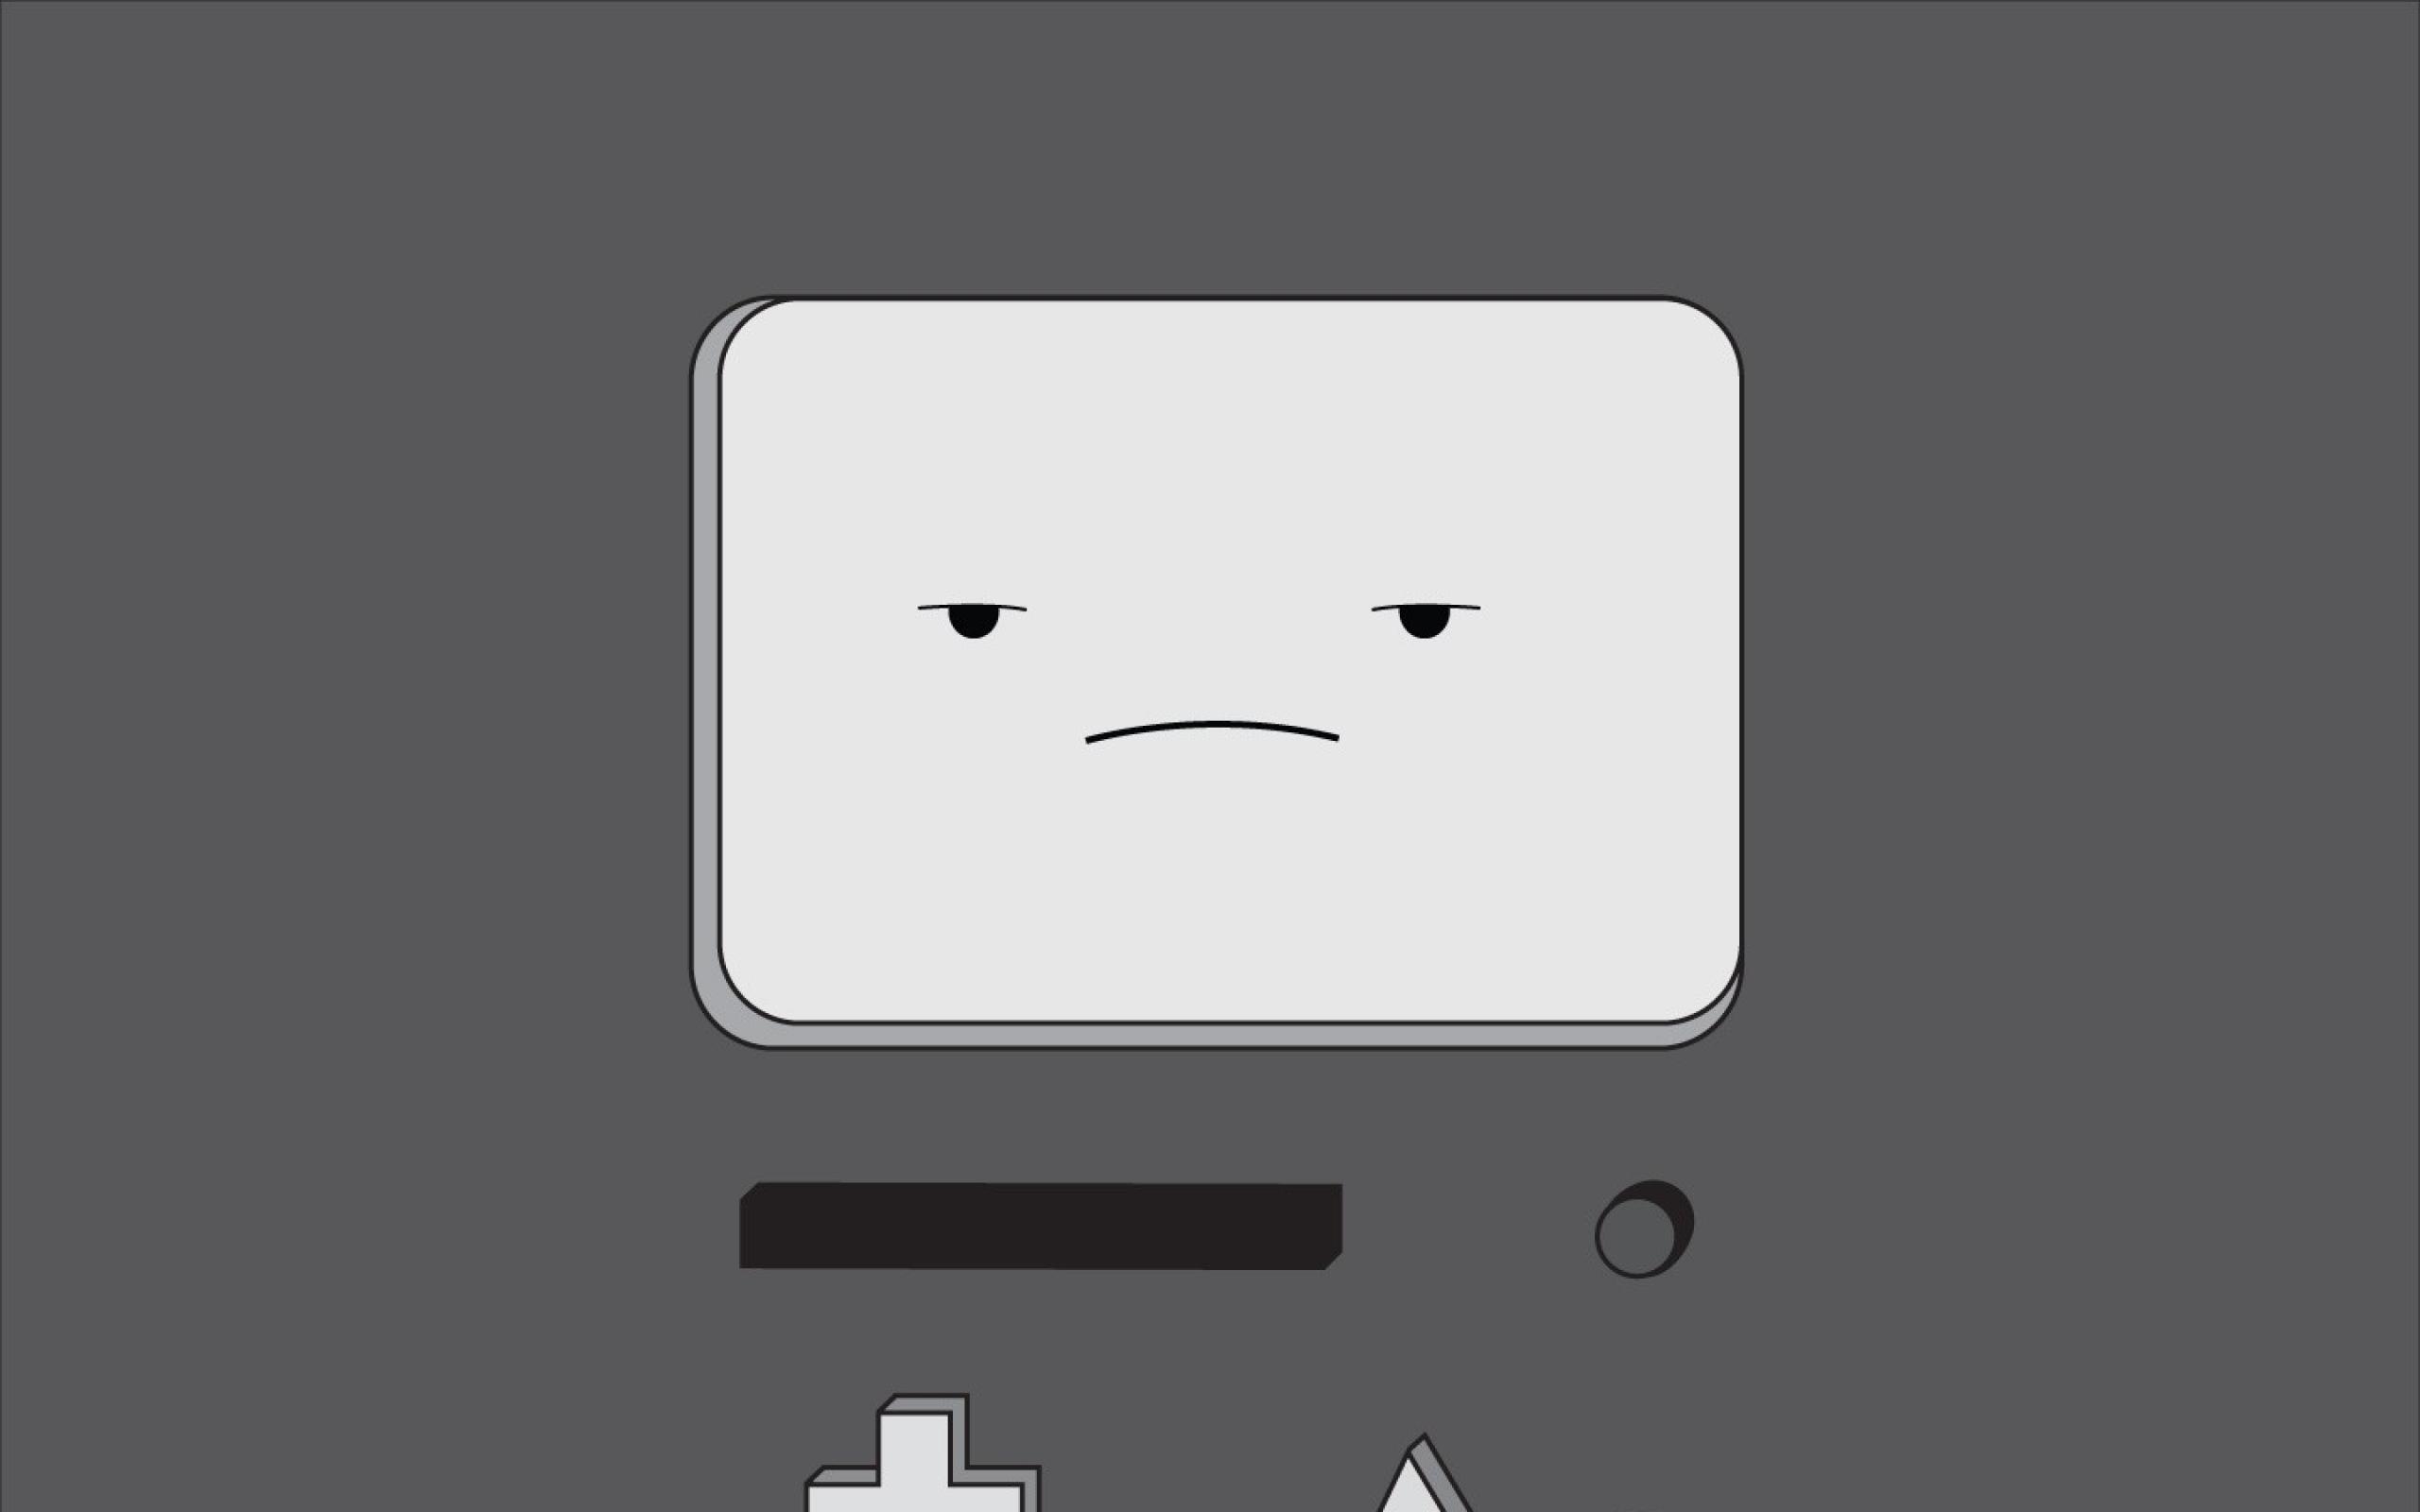 Adventure Time Iphone X Wallpaper Bmo Wallpapers Hd Pixelstalk Net